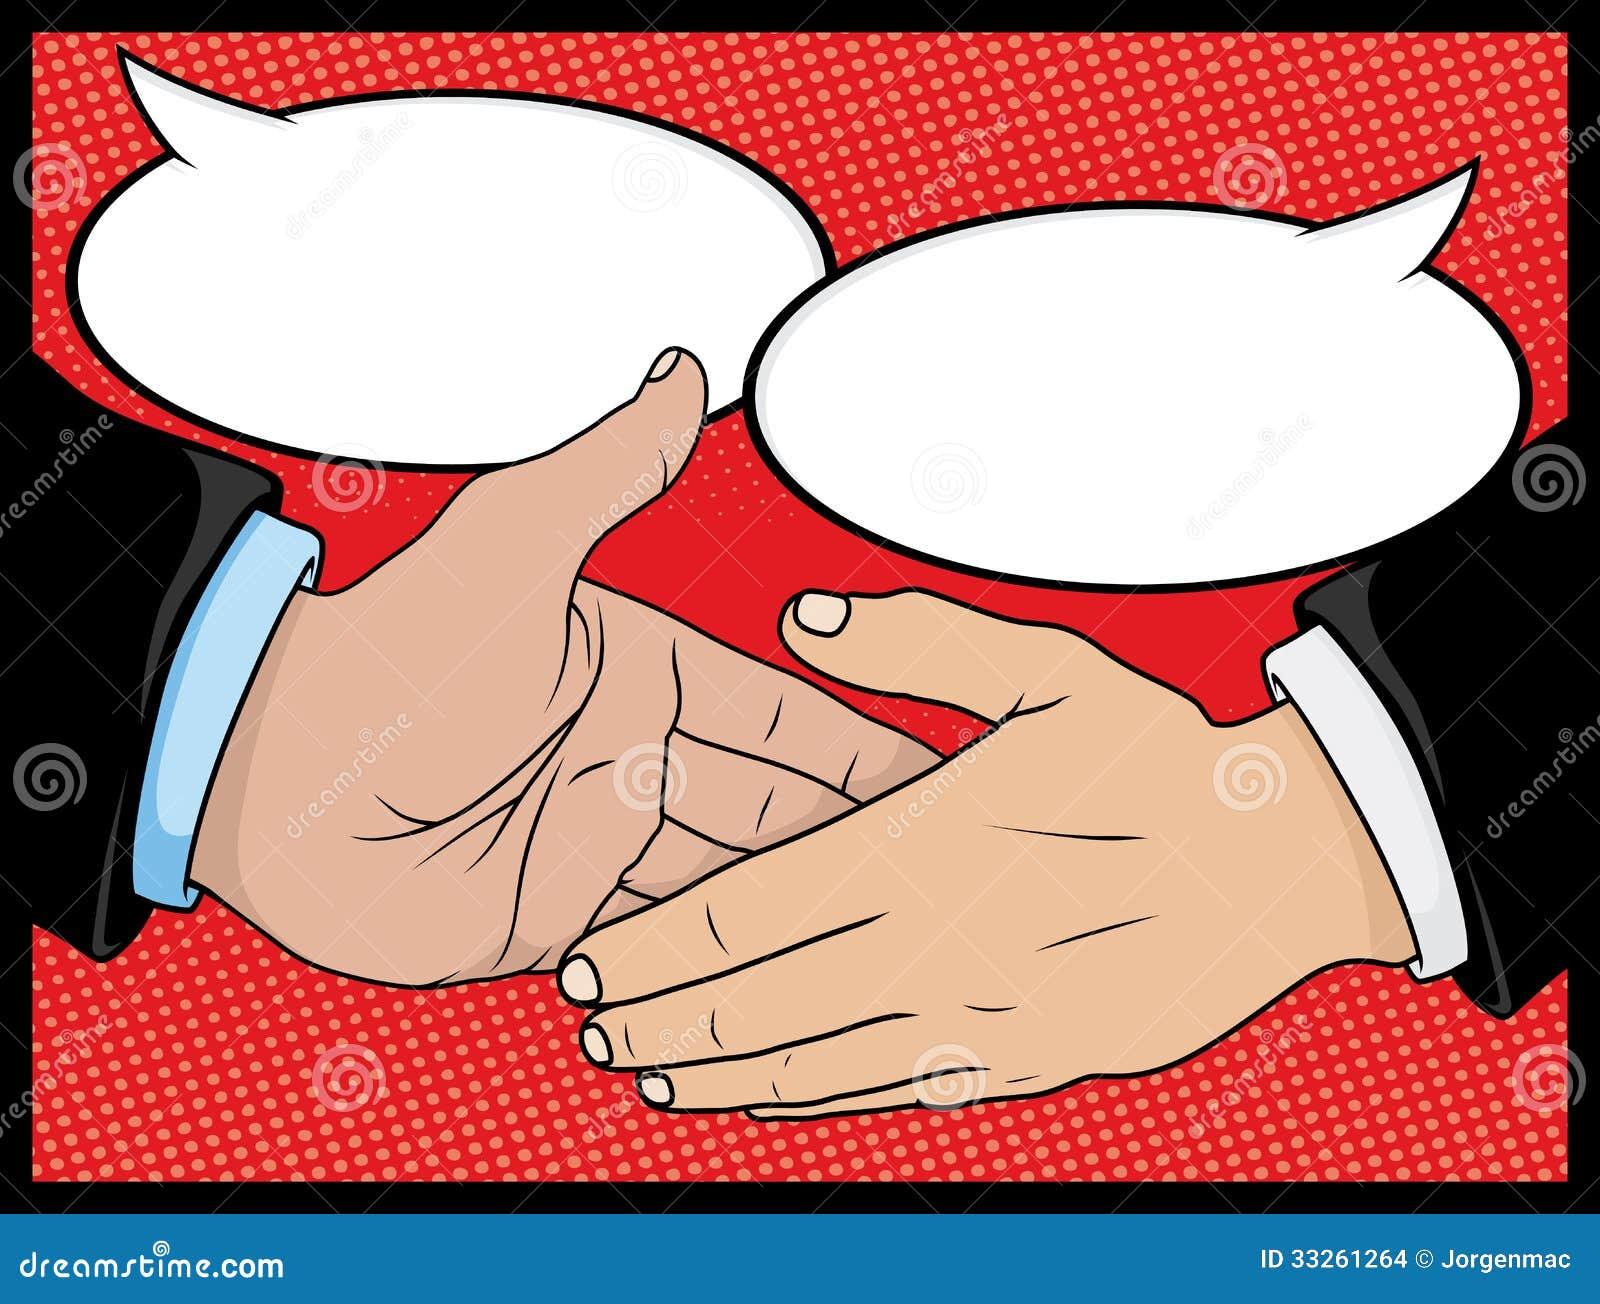 Comic Book Style Handshake Stock Vector Illustration Of Friends